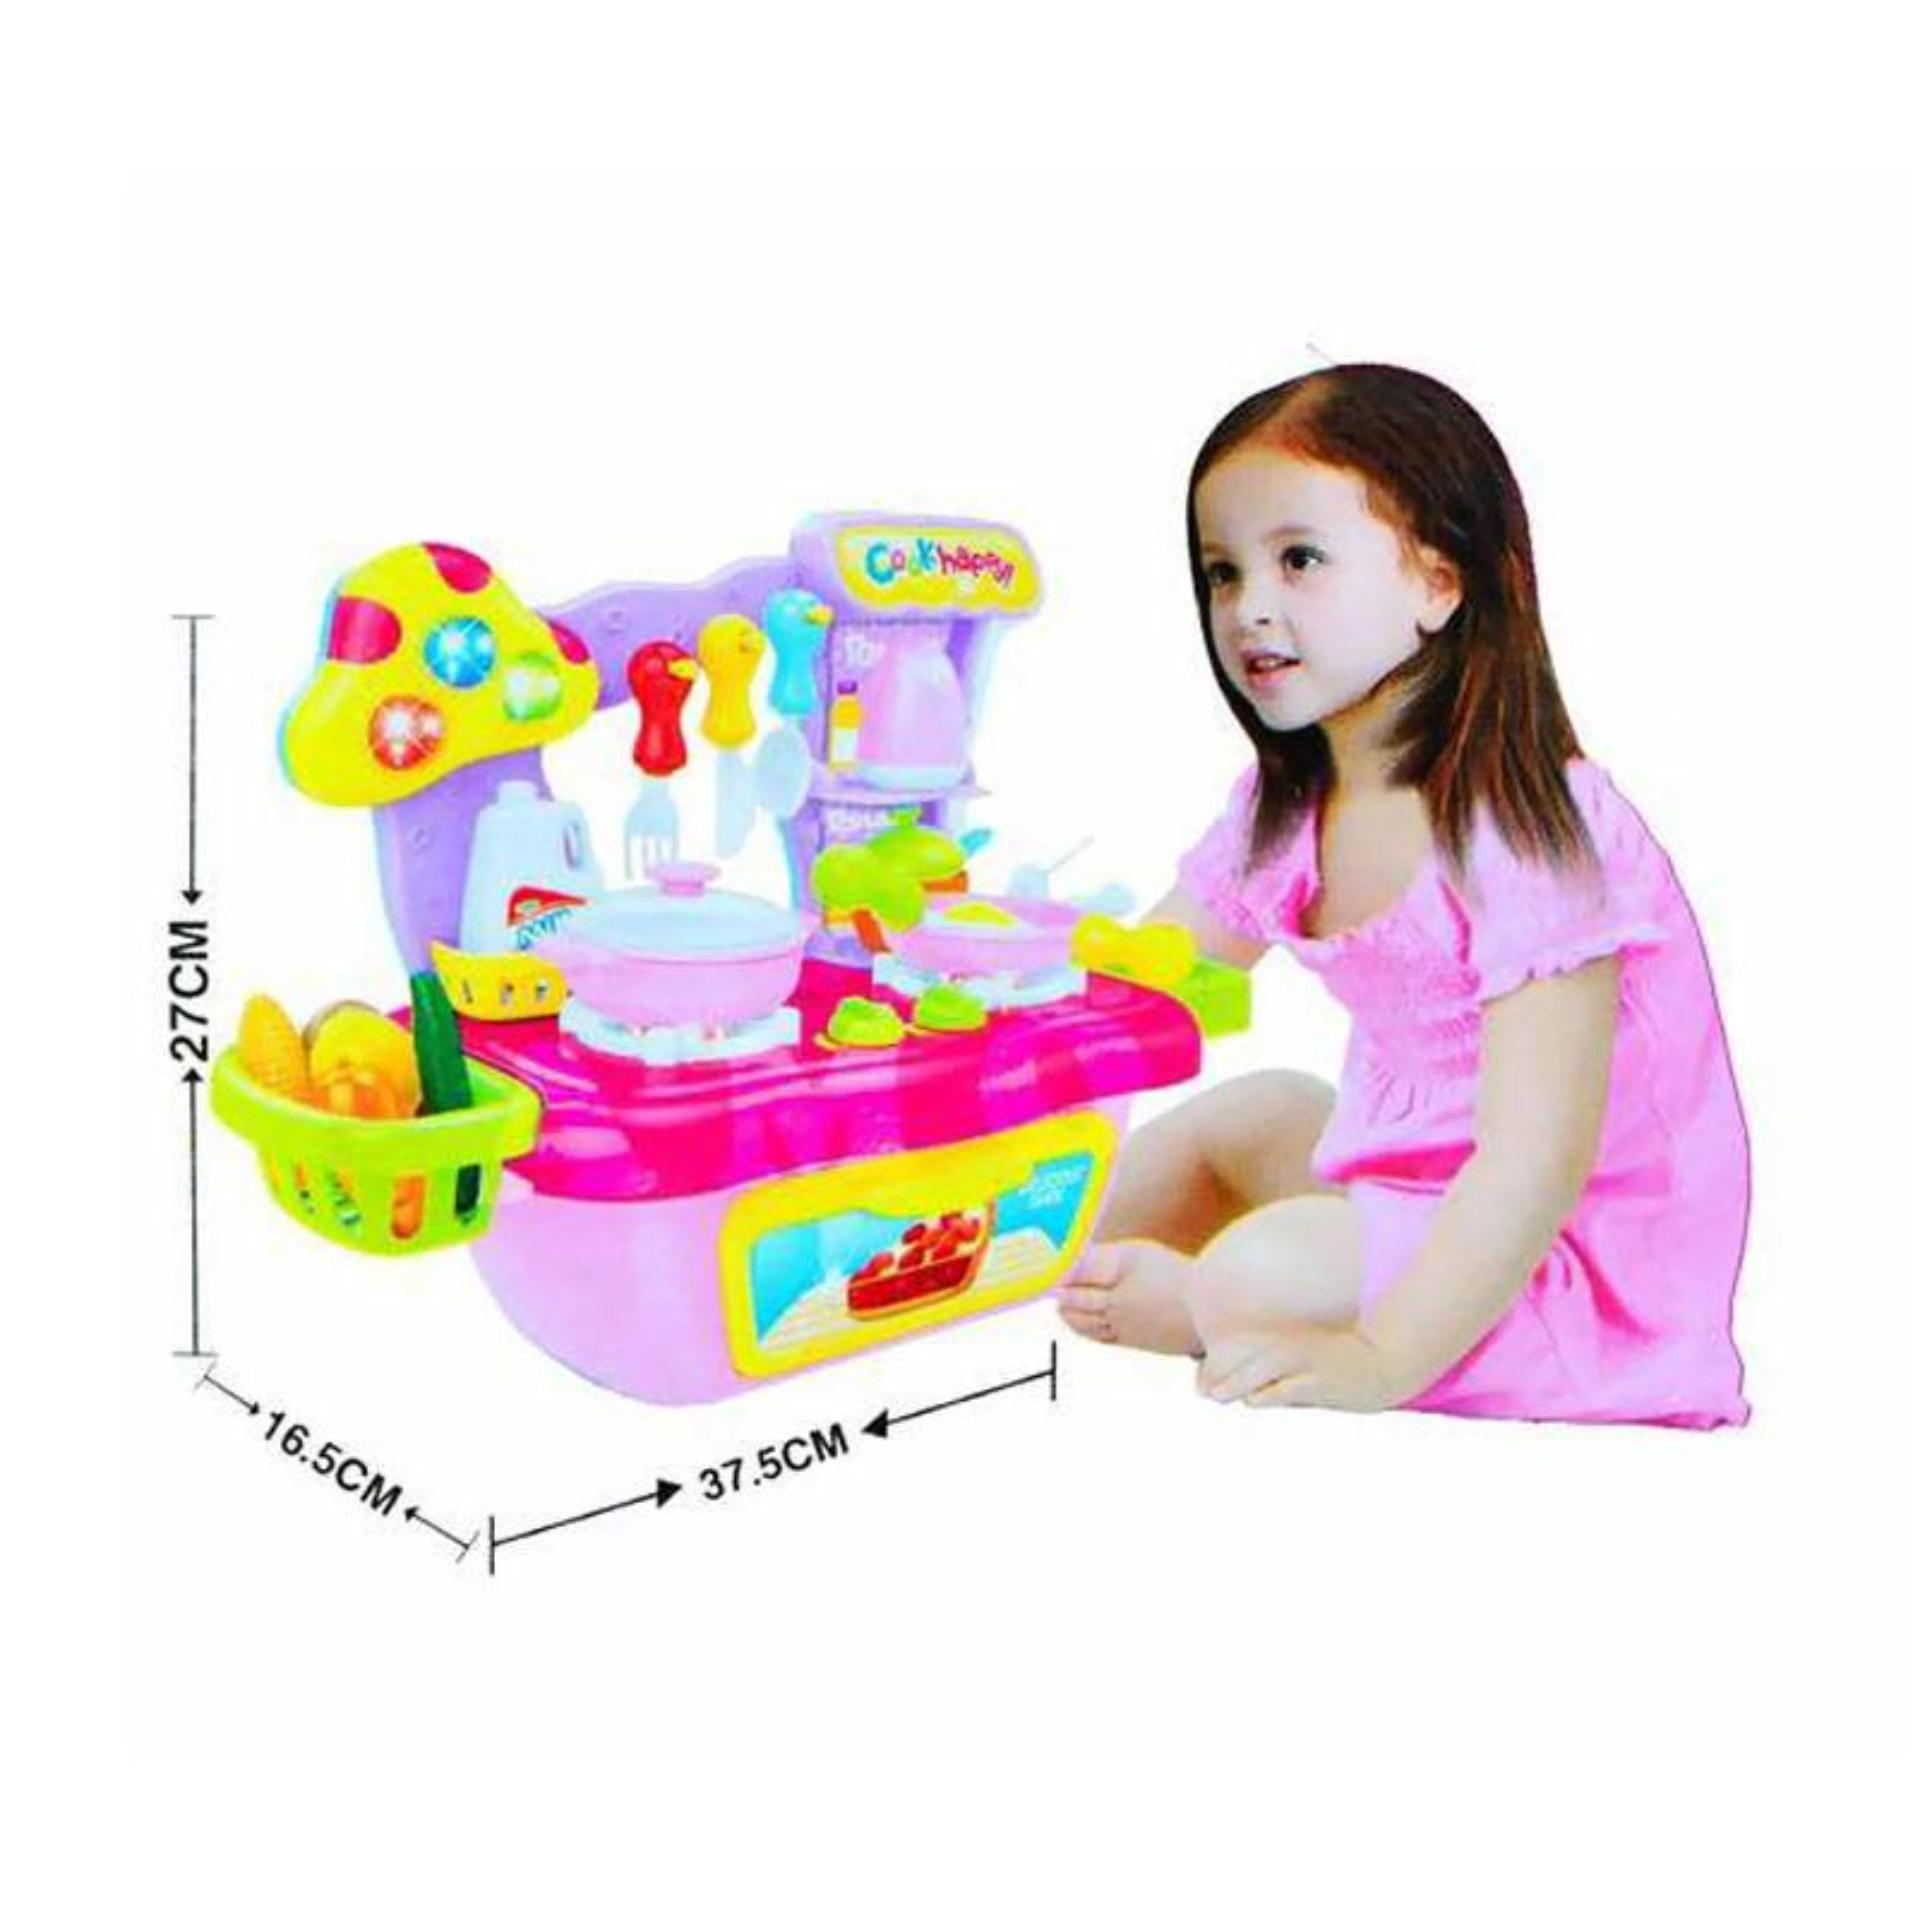 ... AA Toys Cook Fun Kitchen Set Portable Pink - Mainan Anak Masak Masakan ...